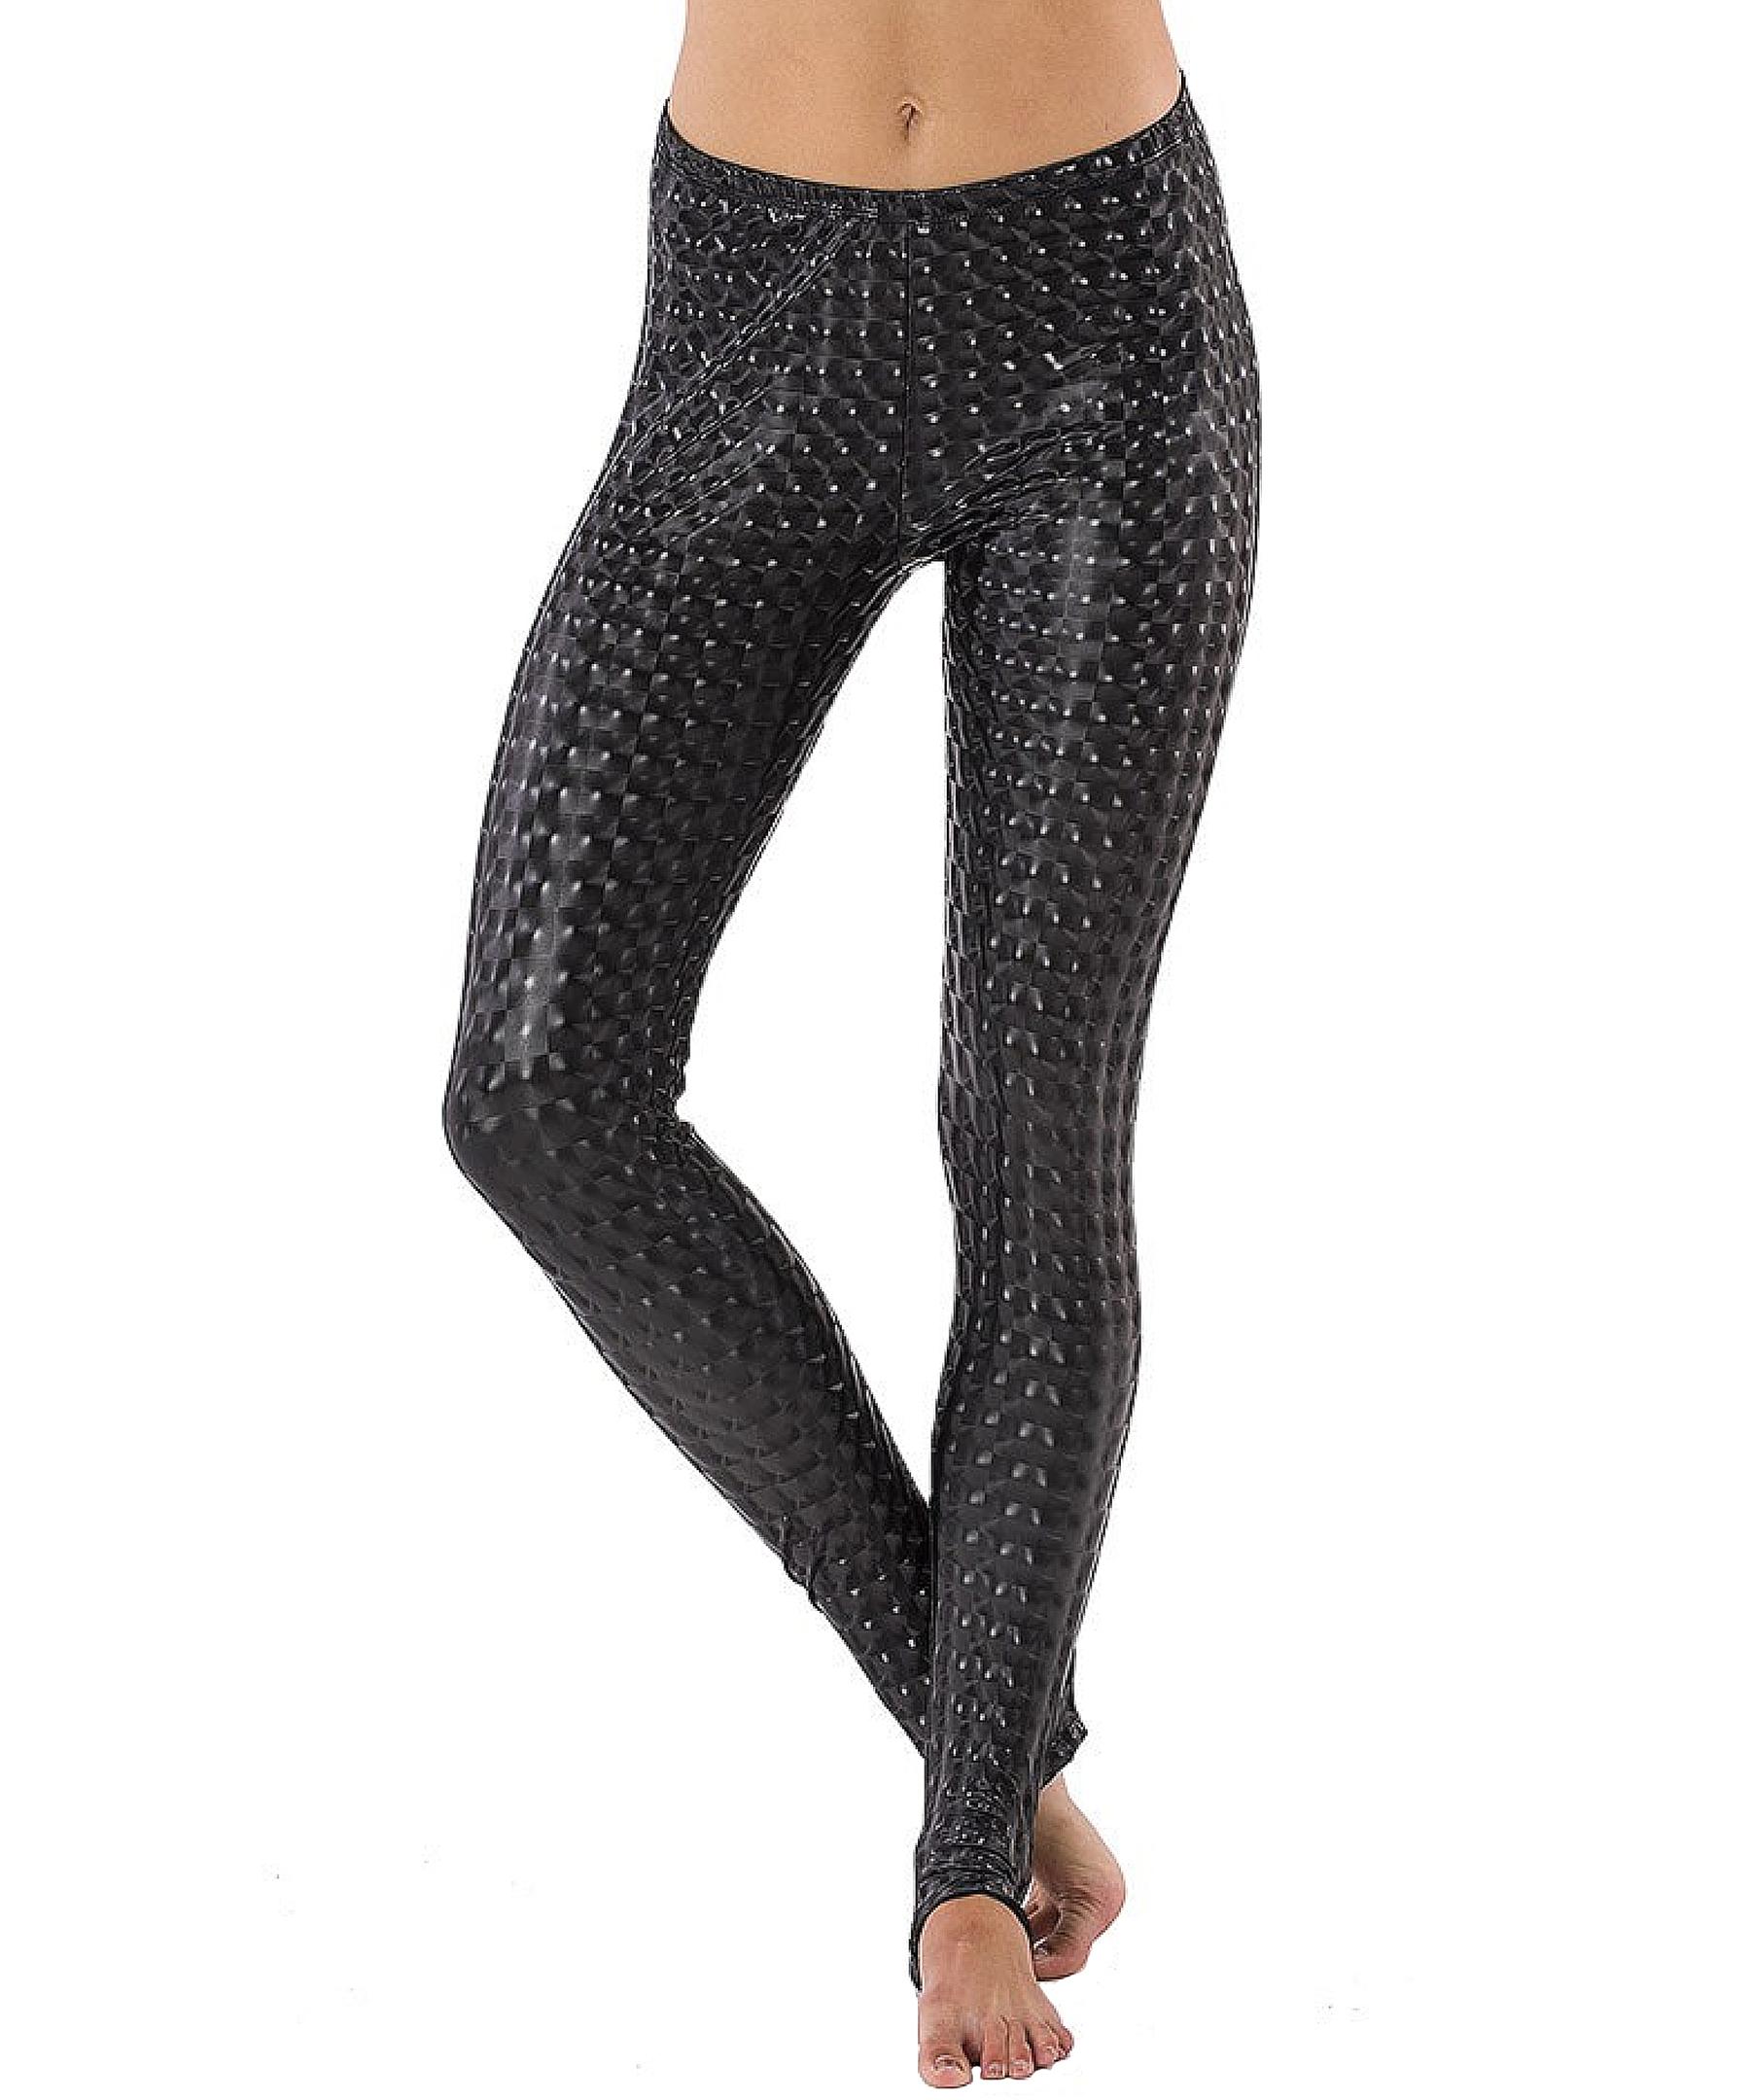 Electric Yoga Prism Leggings In Black